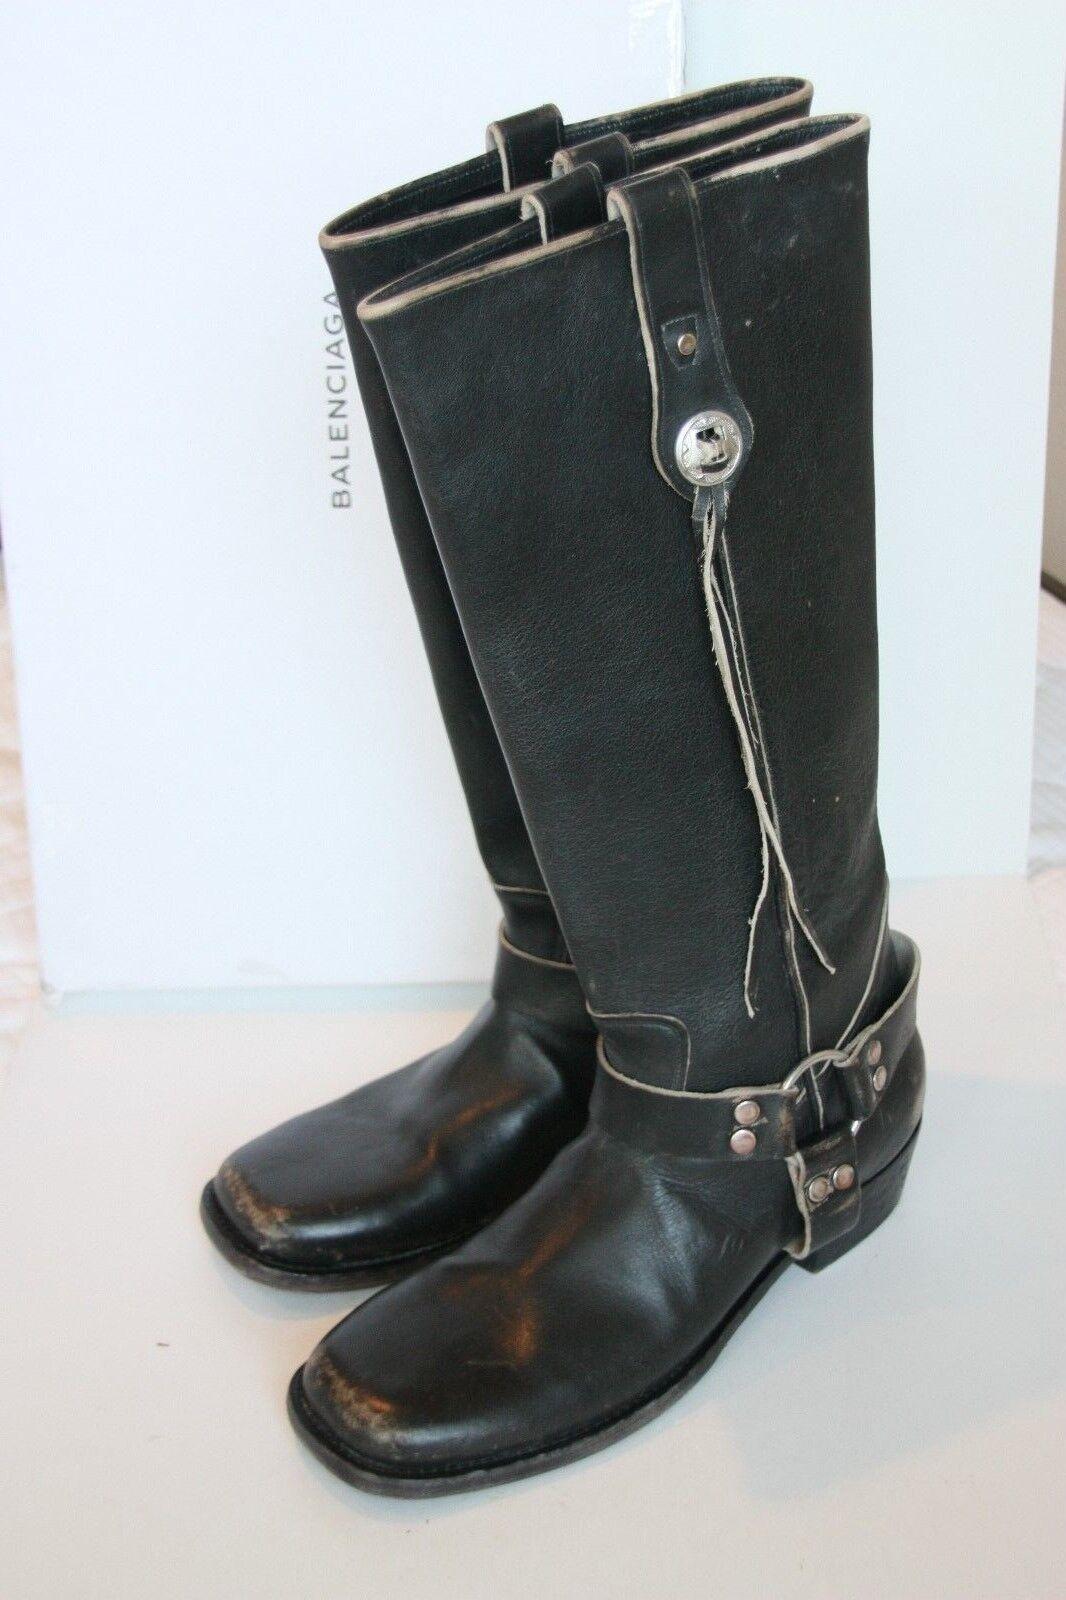 1645 Brand New Balenciaga Stivale Pelle Nori Ecru Distressed Tall Boots 41   11